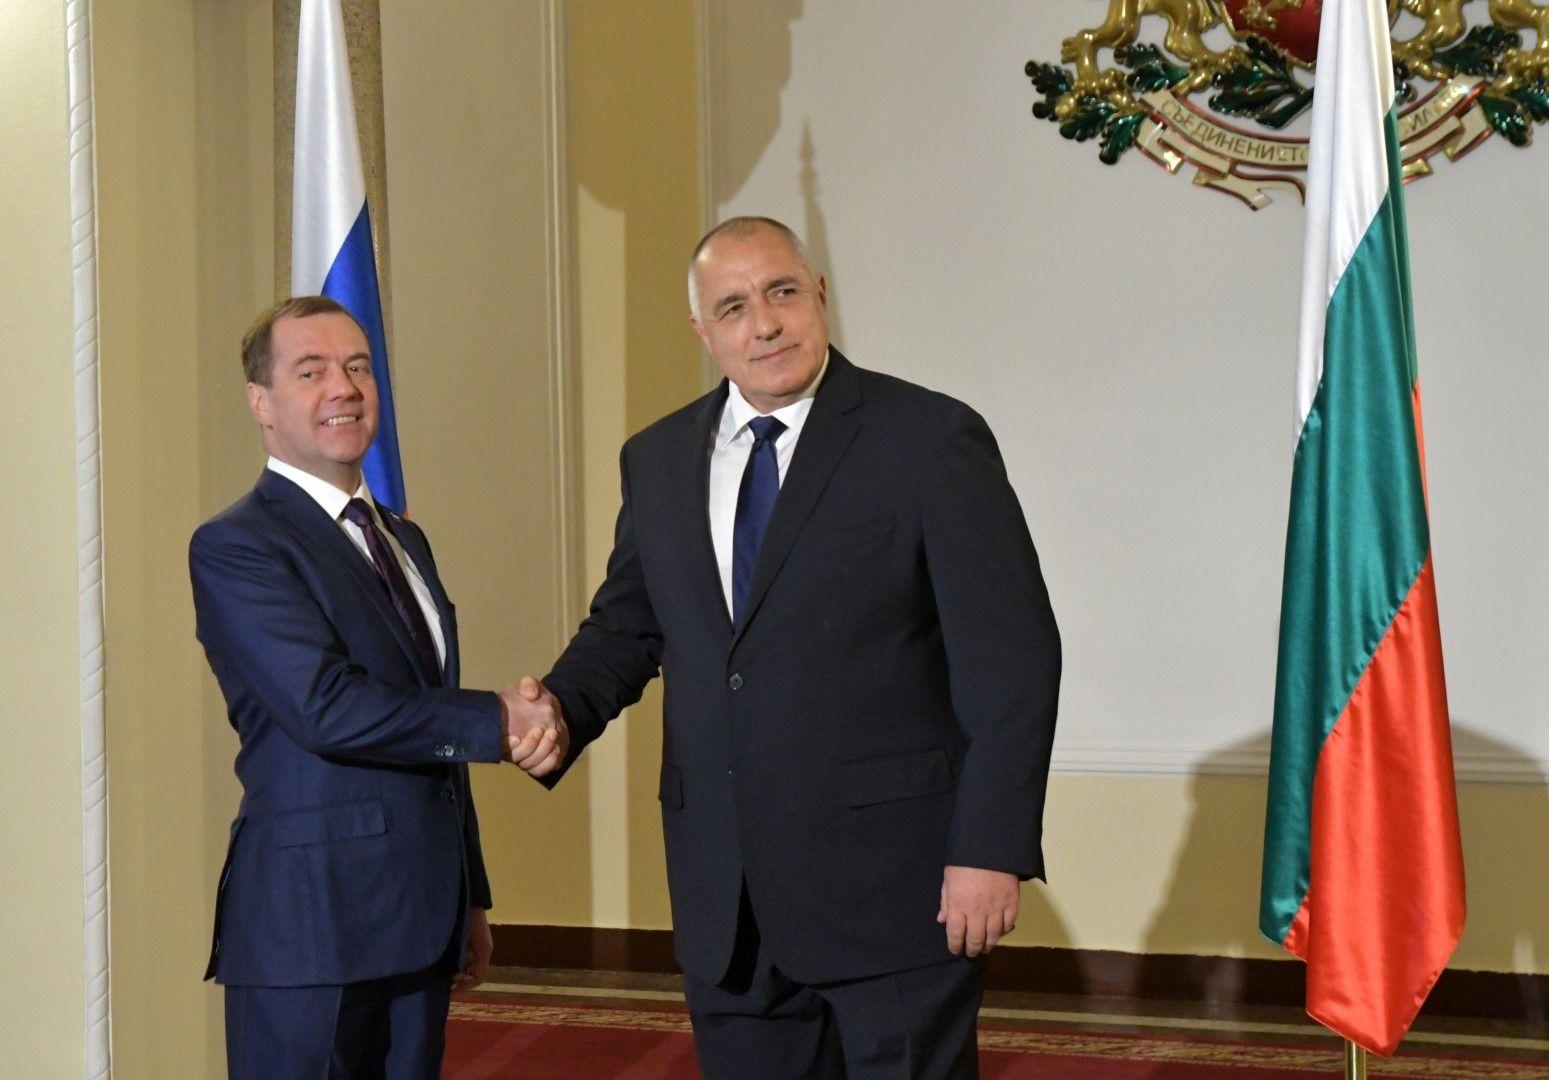 През март Бойко Борисов посрещна Дмитрий Медведев в София